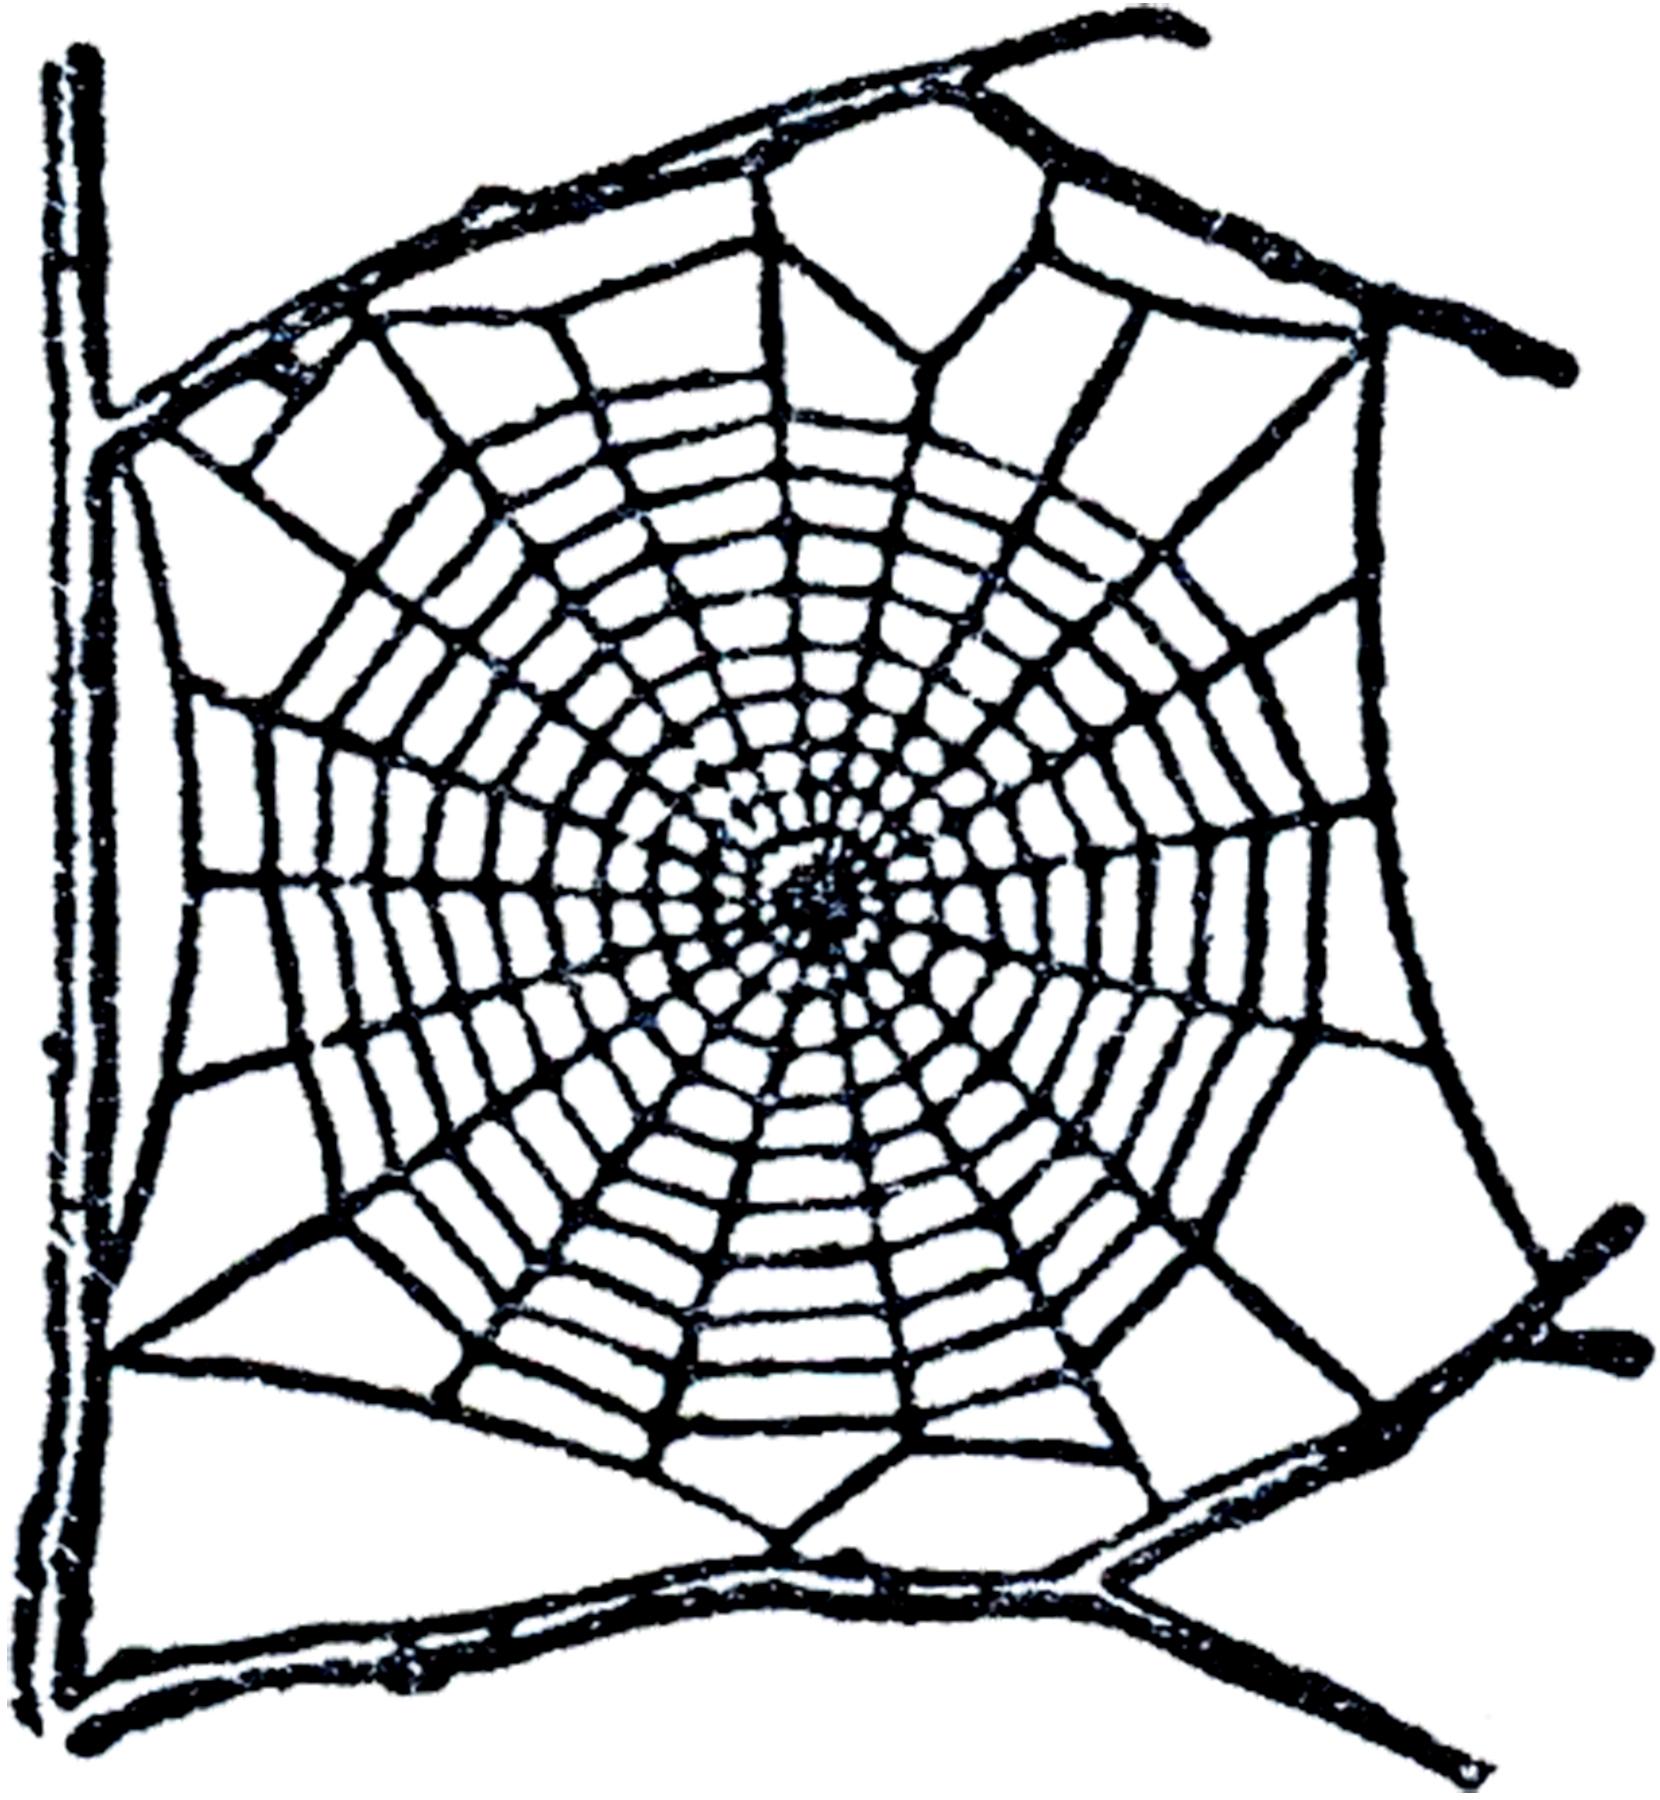 corner-spider-web-clipart-Free-Spider-Web-Clip-Art-GraphicsFairy jpgSpider Web Clip Art